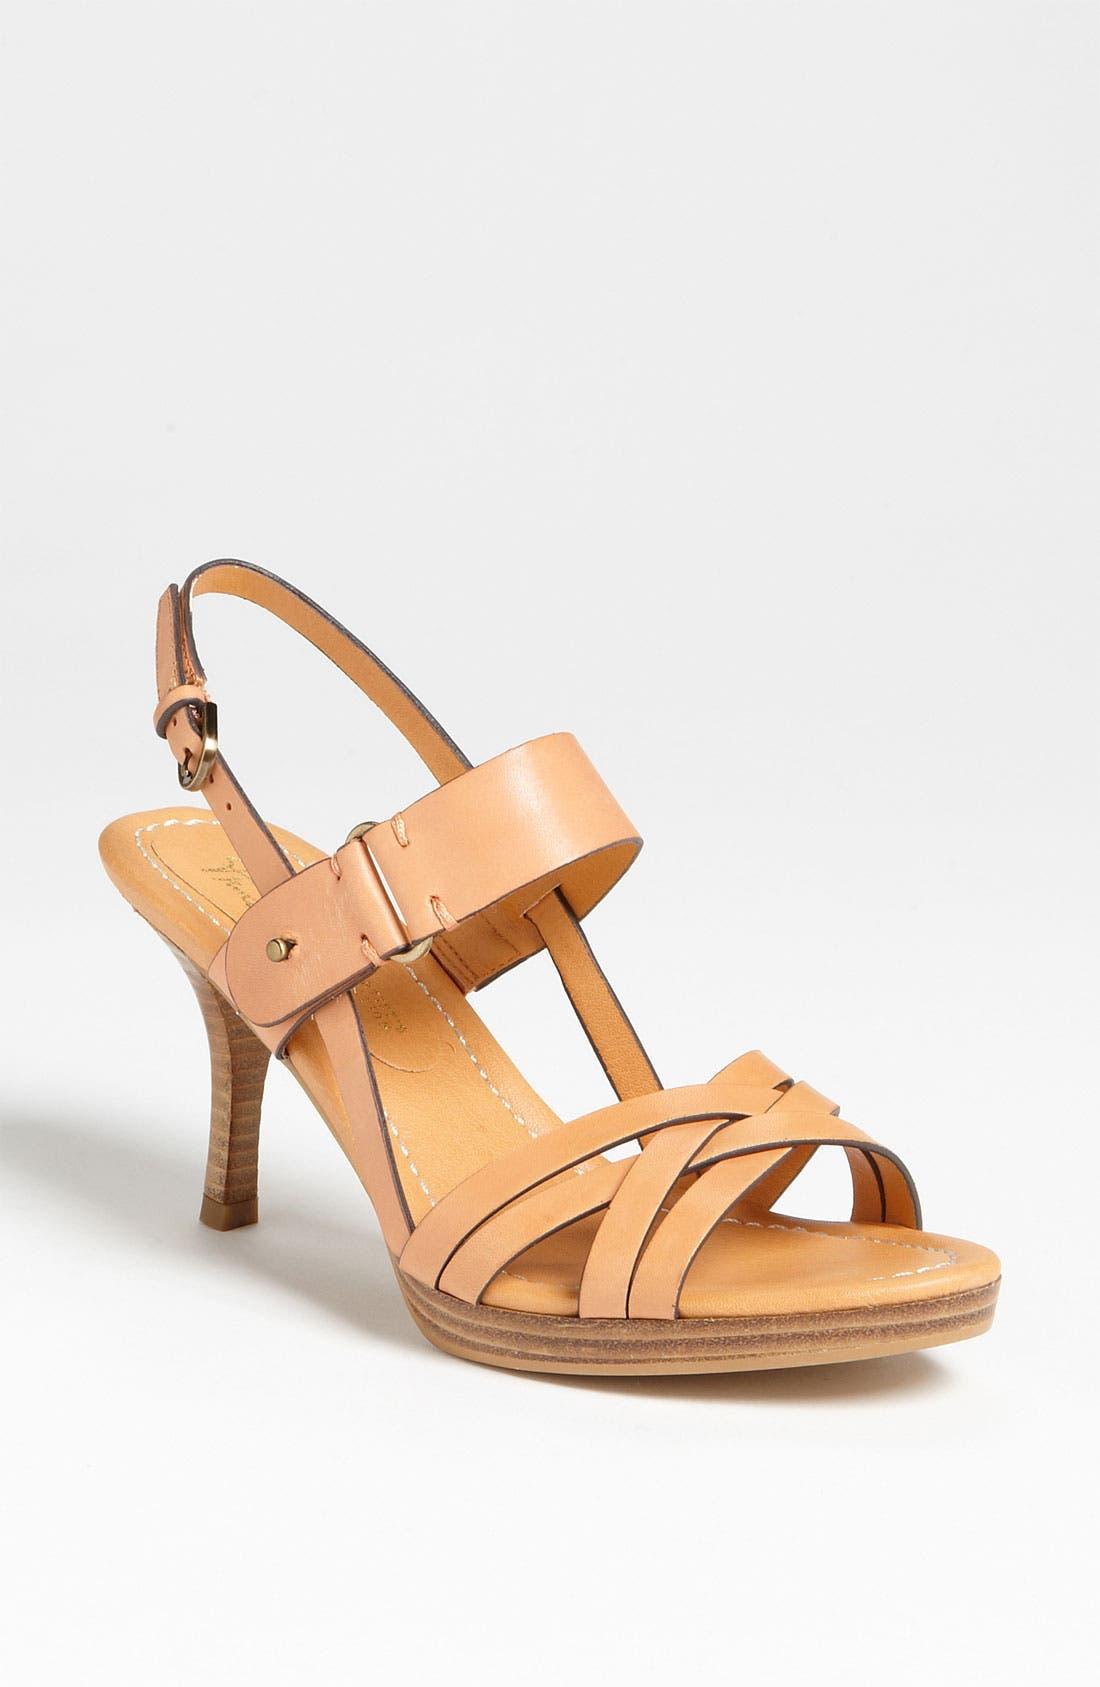 Alternate Image 1 Selected - Franco Sarto 'Ambra' Sandal